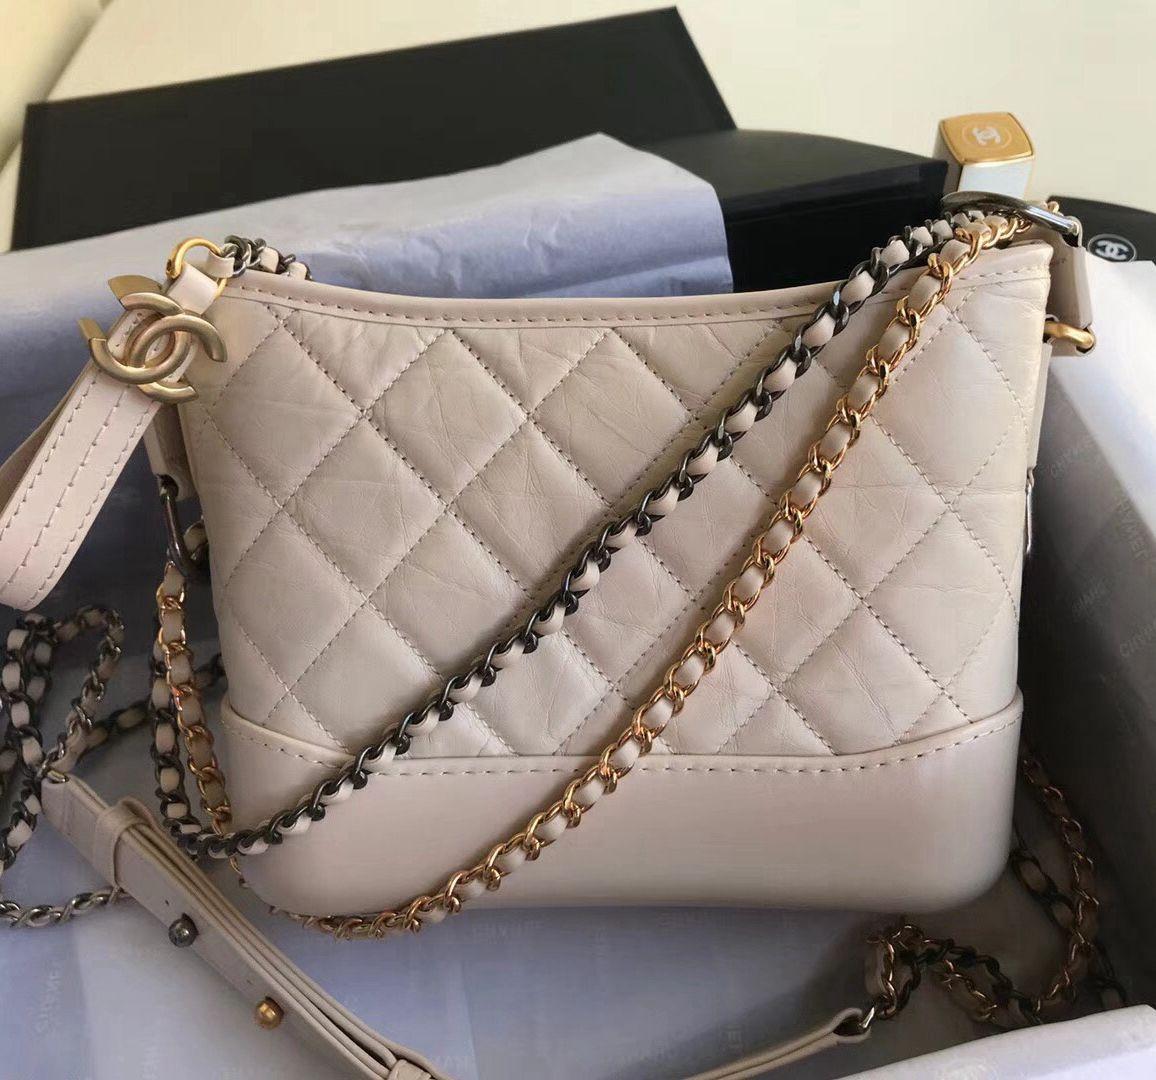 e0efccde77aea9 Chanel's Gabrielle Small Hobo Bag A91810 Nude 2018 | Handbags saint ...